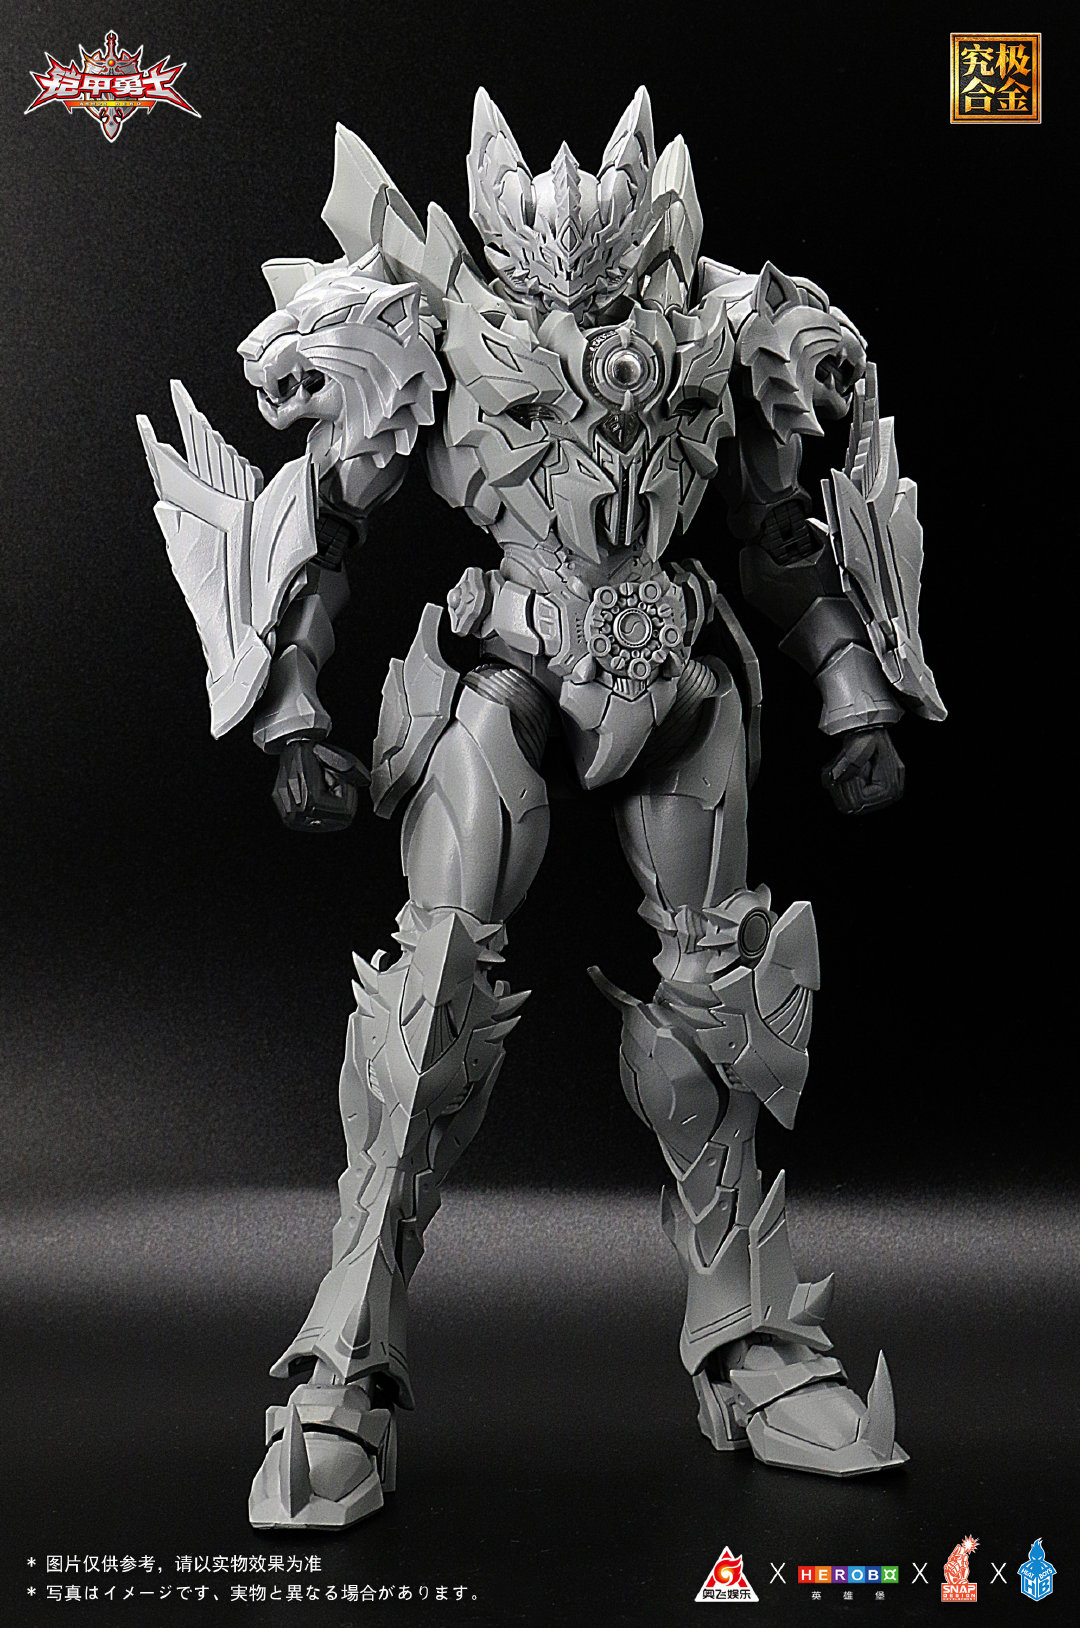 S535_Armor_hero_Emperor_022.jpg